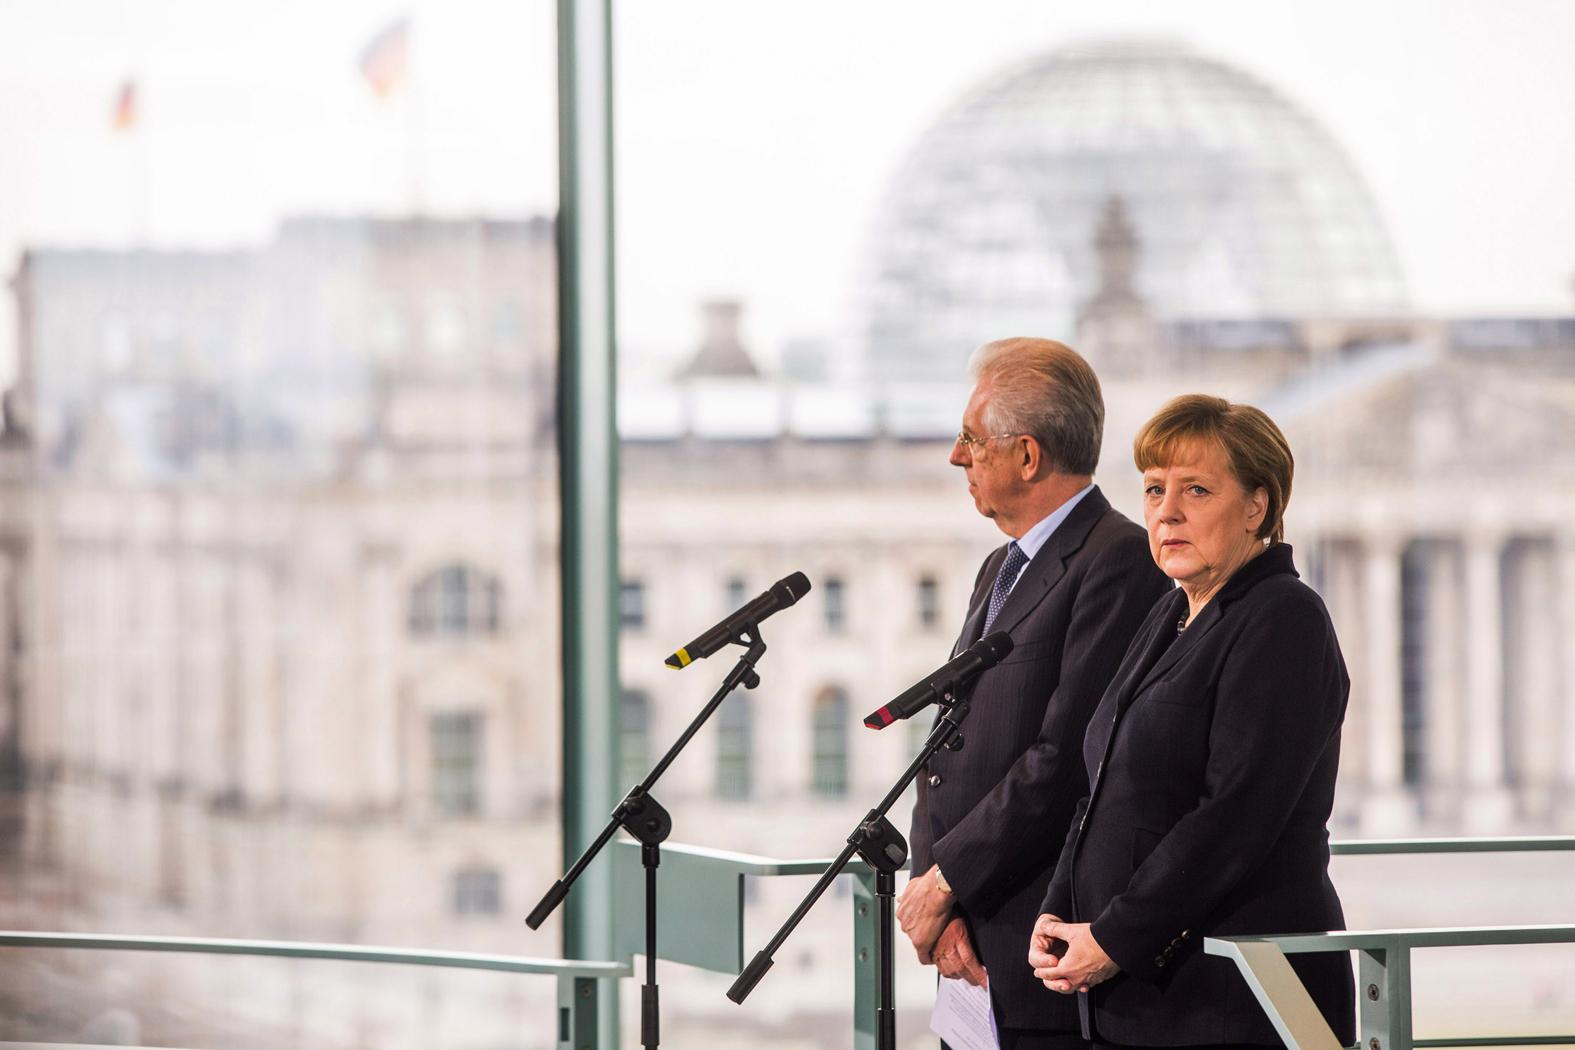 Mario Monti Meets With Angela Merkel